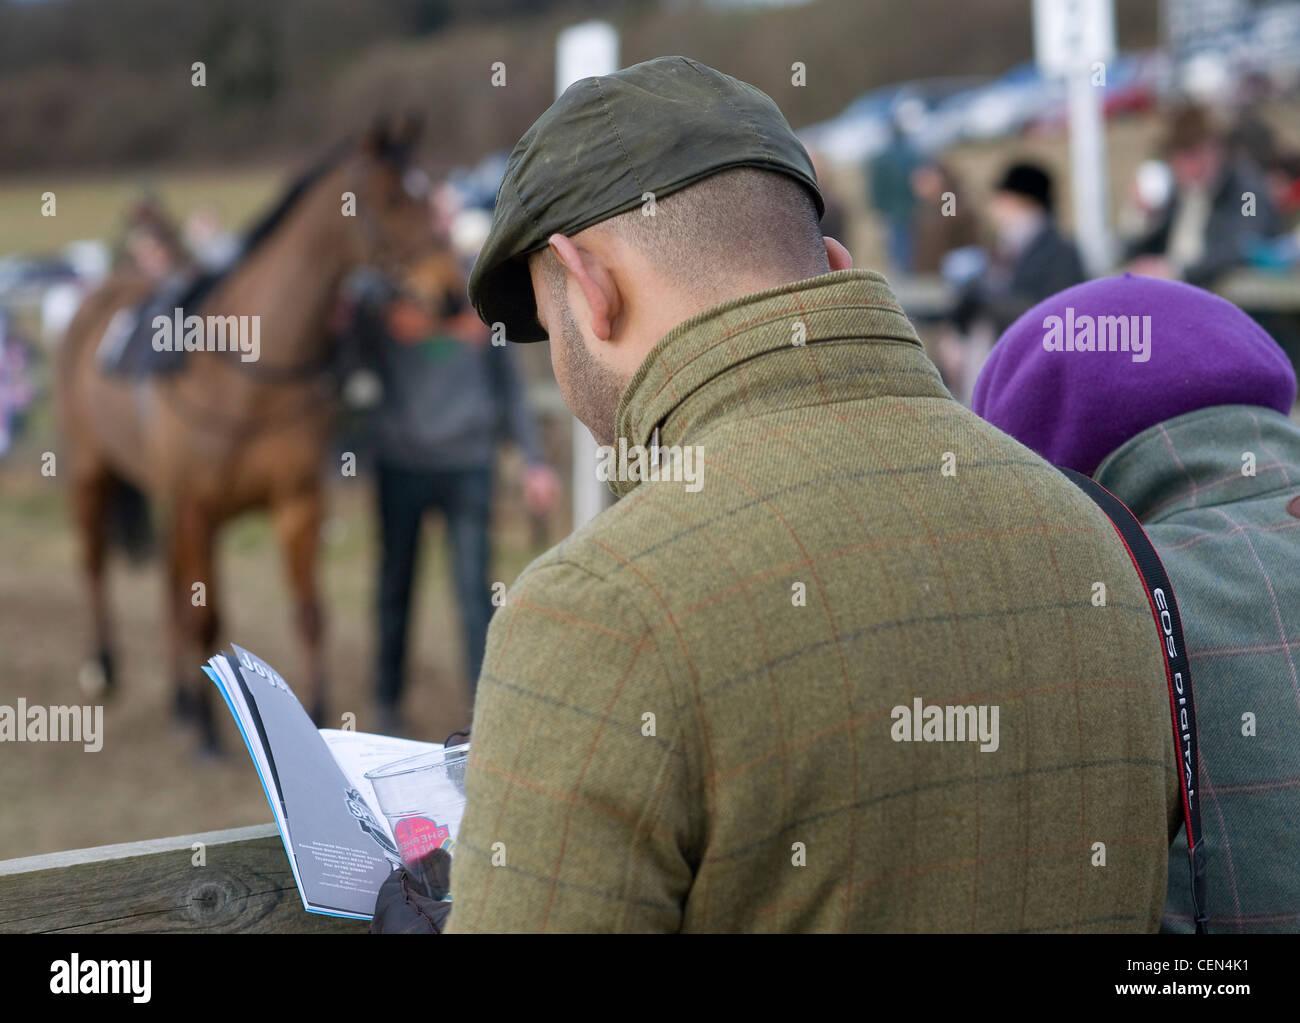 Un jugador lee la tarjeta antes de la carrera de Shepherd Neame Mens carrera abierta al sureste de Hunts Club carreras Imagen De Stock